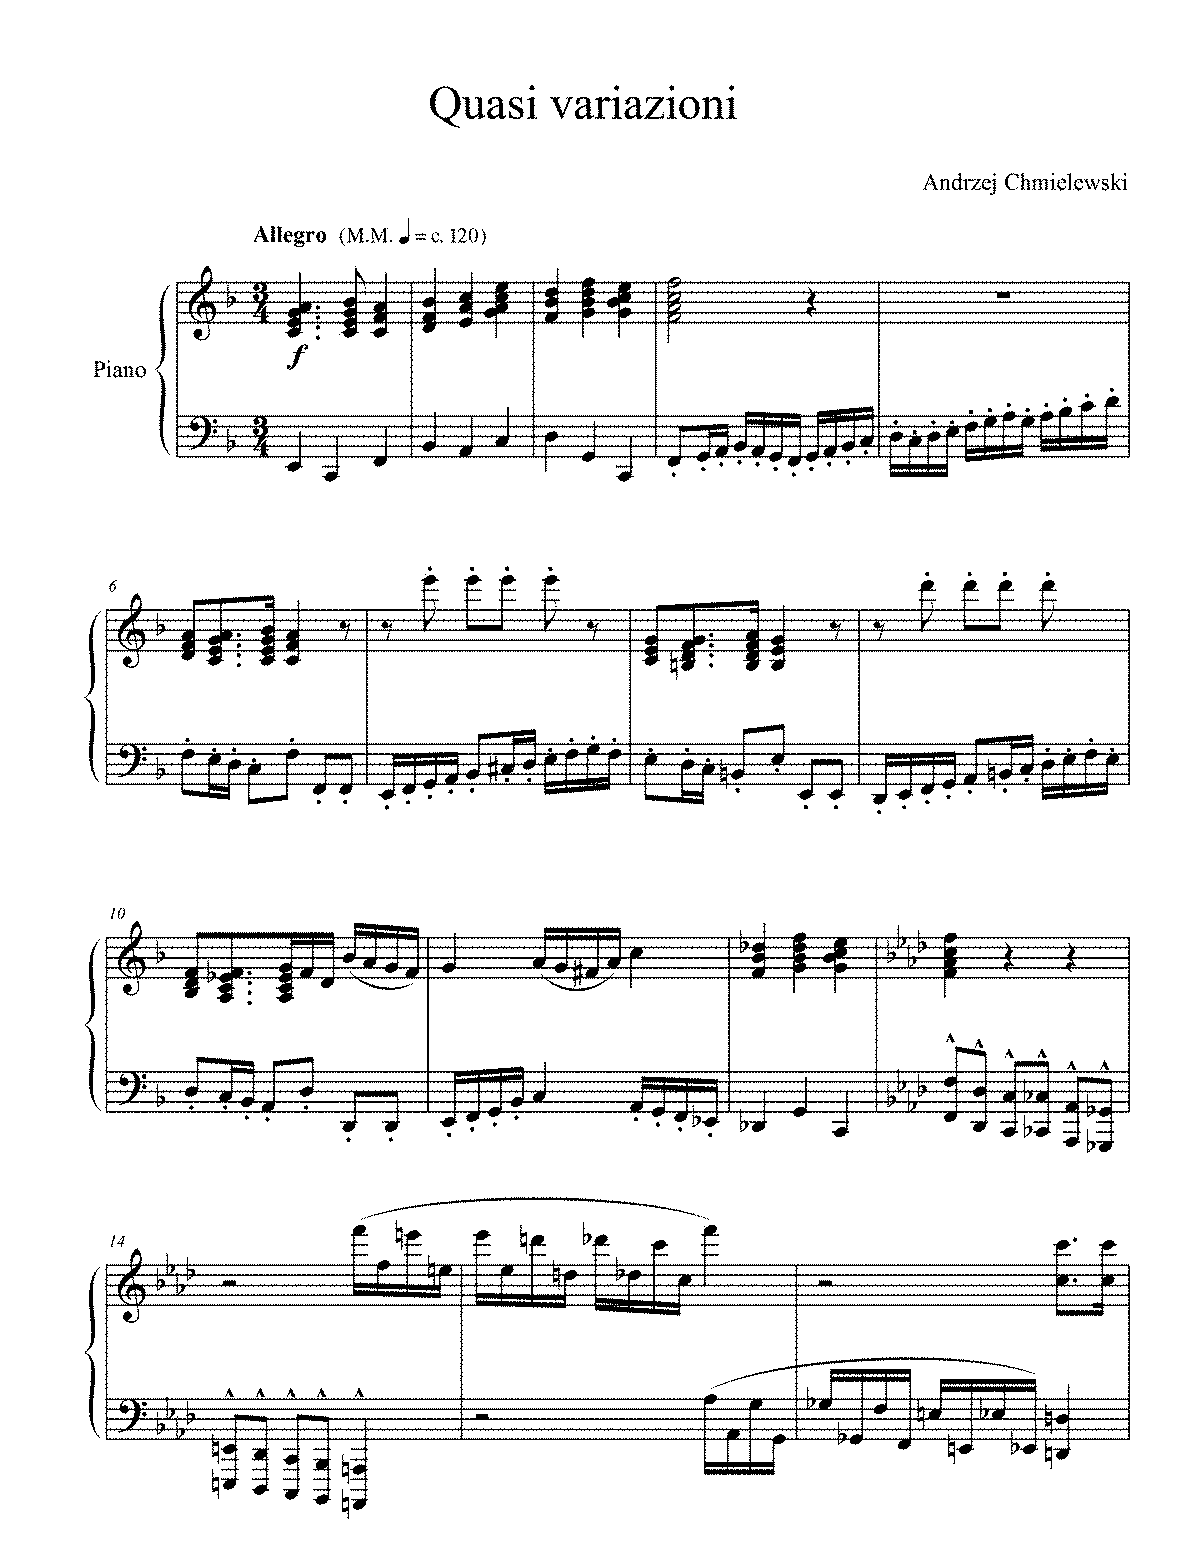 Quasi variazioni (Chmielewski, Andrzej) - IMSLP/Petrucci Music